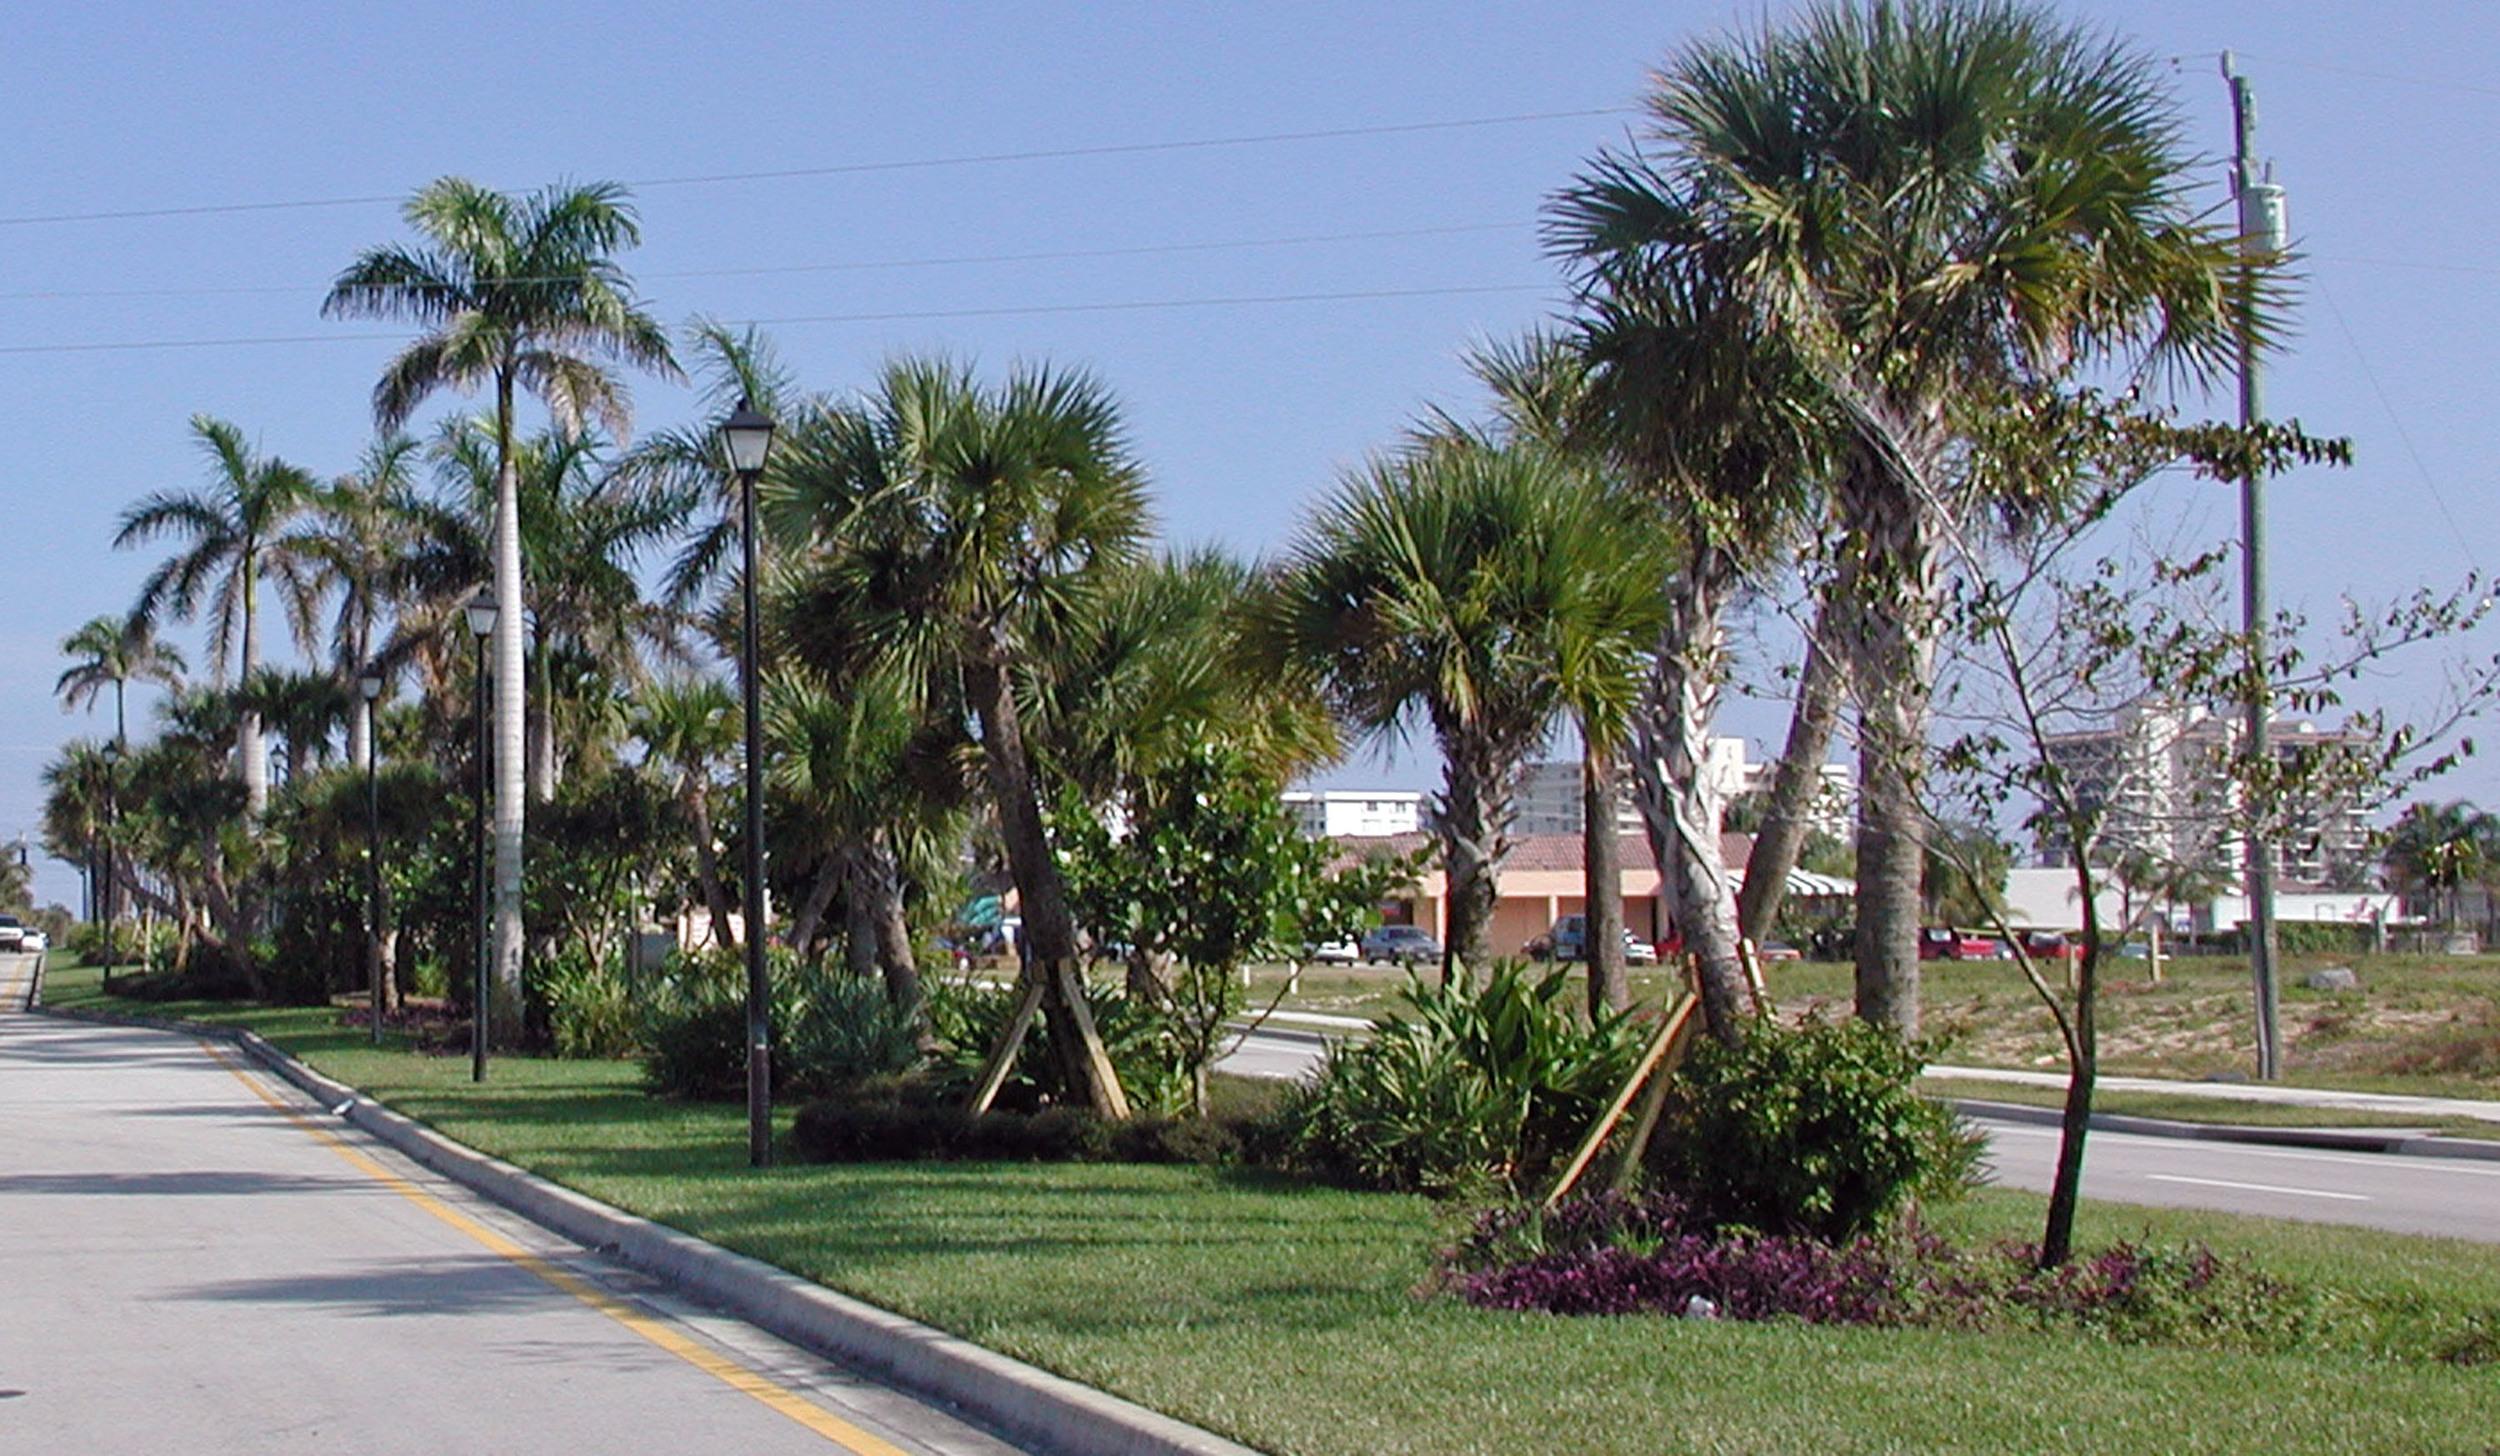 Donald Ross Road Palm Beach County Florida Landscape Sabal Plams.jpg